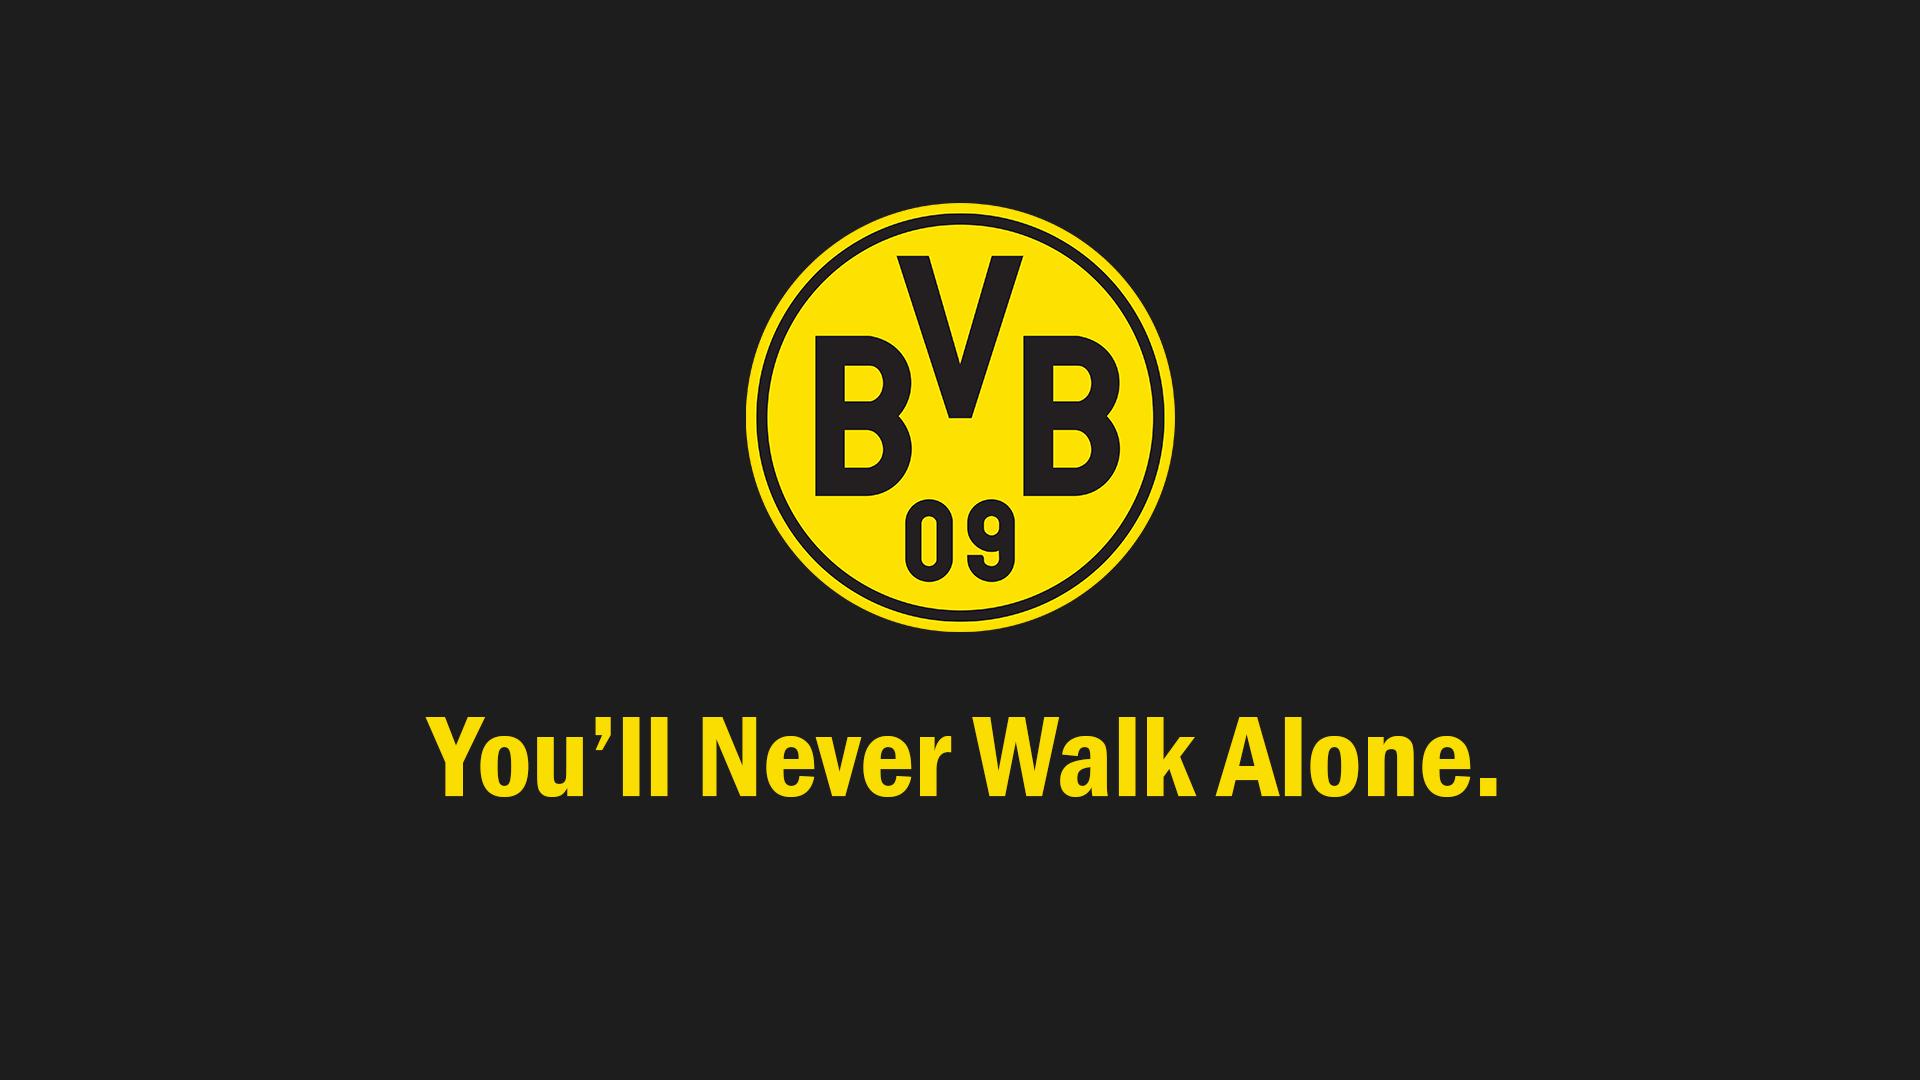 Borussia Dortmund Bvb You Ll Never Walk Alone By Dirtyc0re On